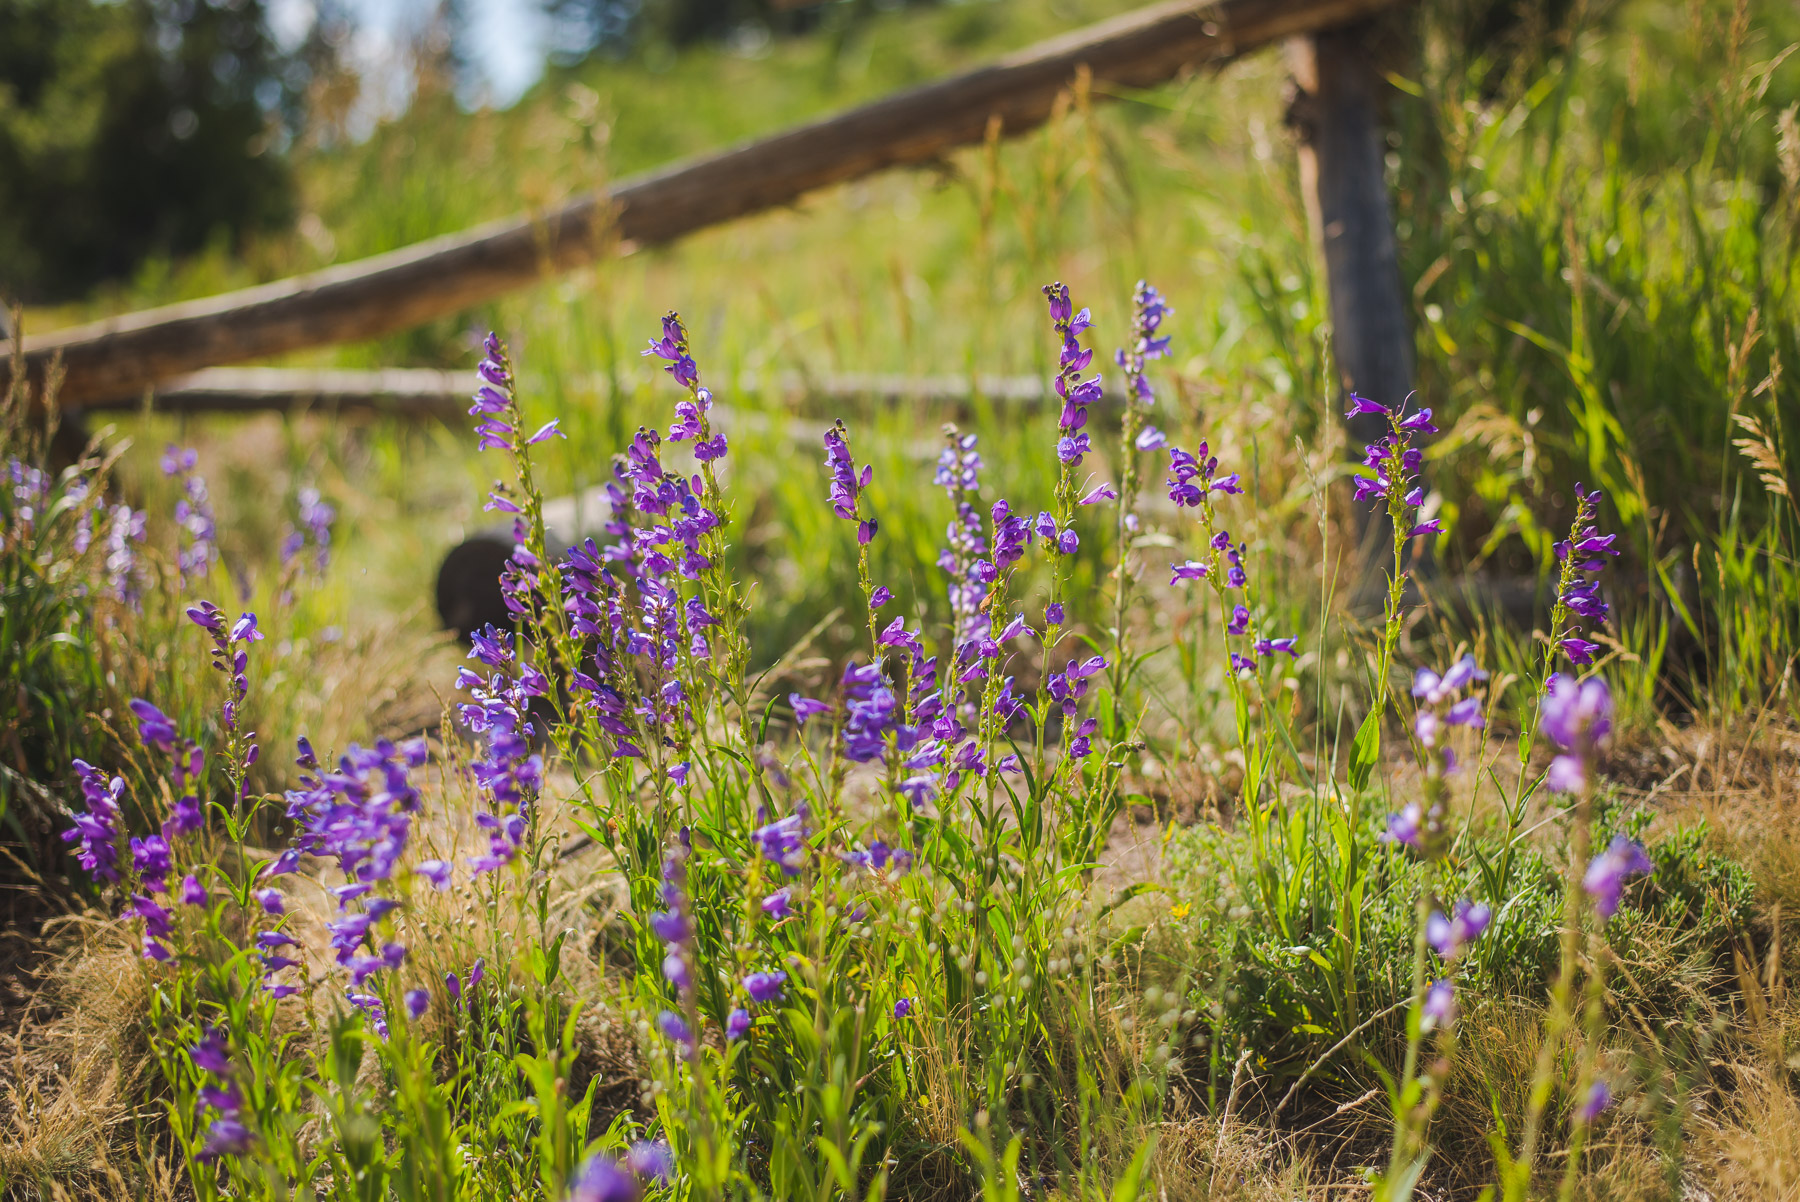 colorado bride and groom small wedding purple wildflowers | summit mountain weddings